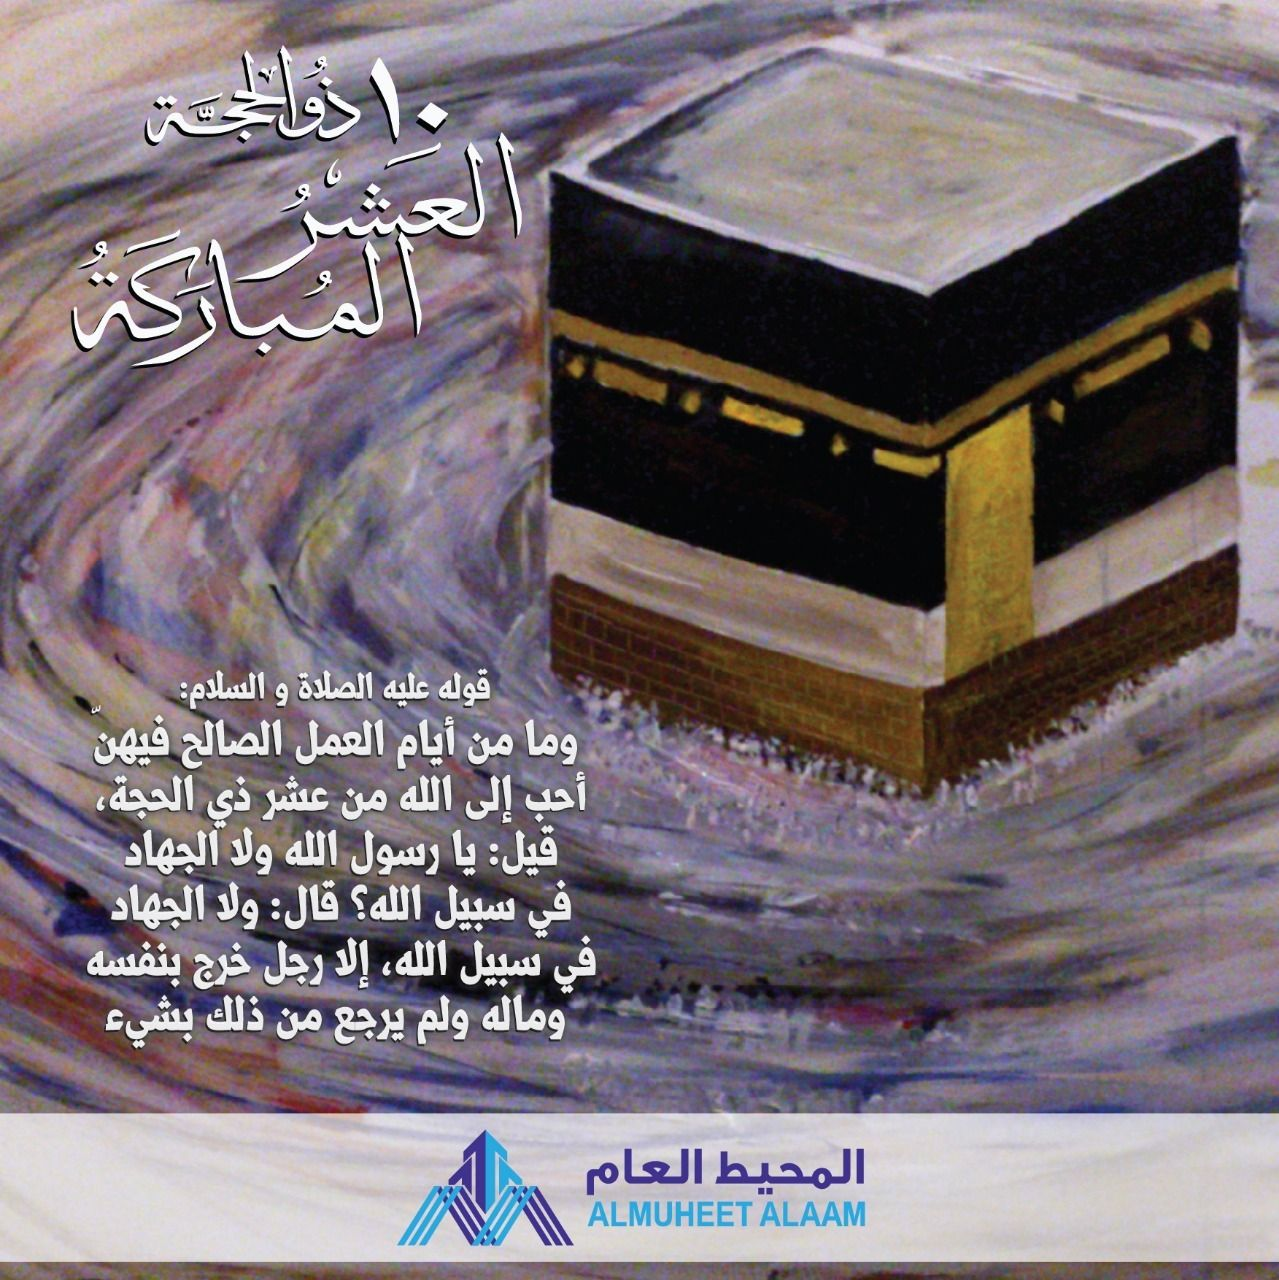 Pin By Fawzy On ال10 من ذي الحجه Decorative Boxes Wallpaper Ramadan